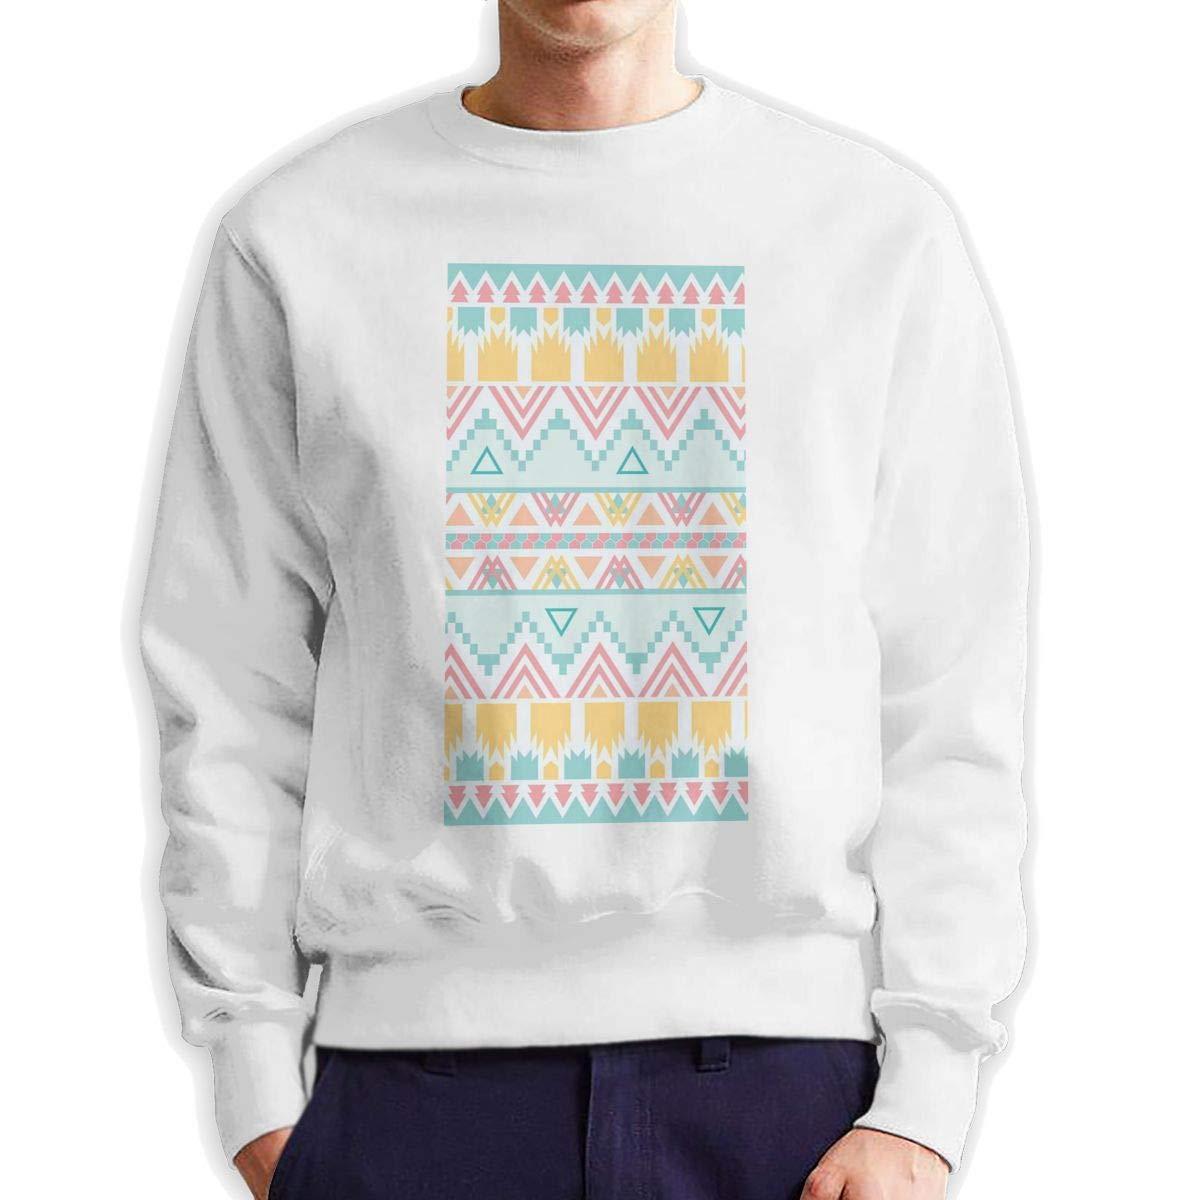 RUANJB Mens Lovely Background Long Sleeve Crewneck Sweatshirt